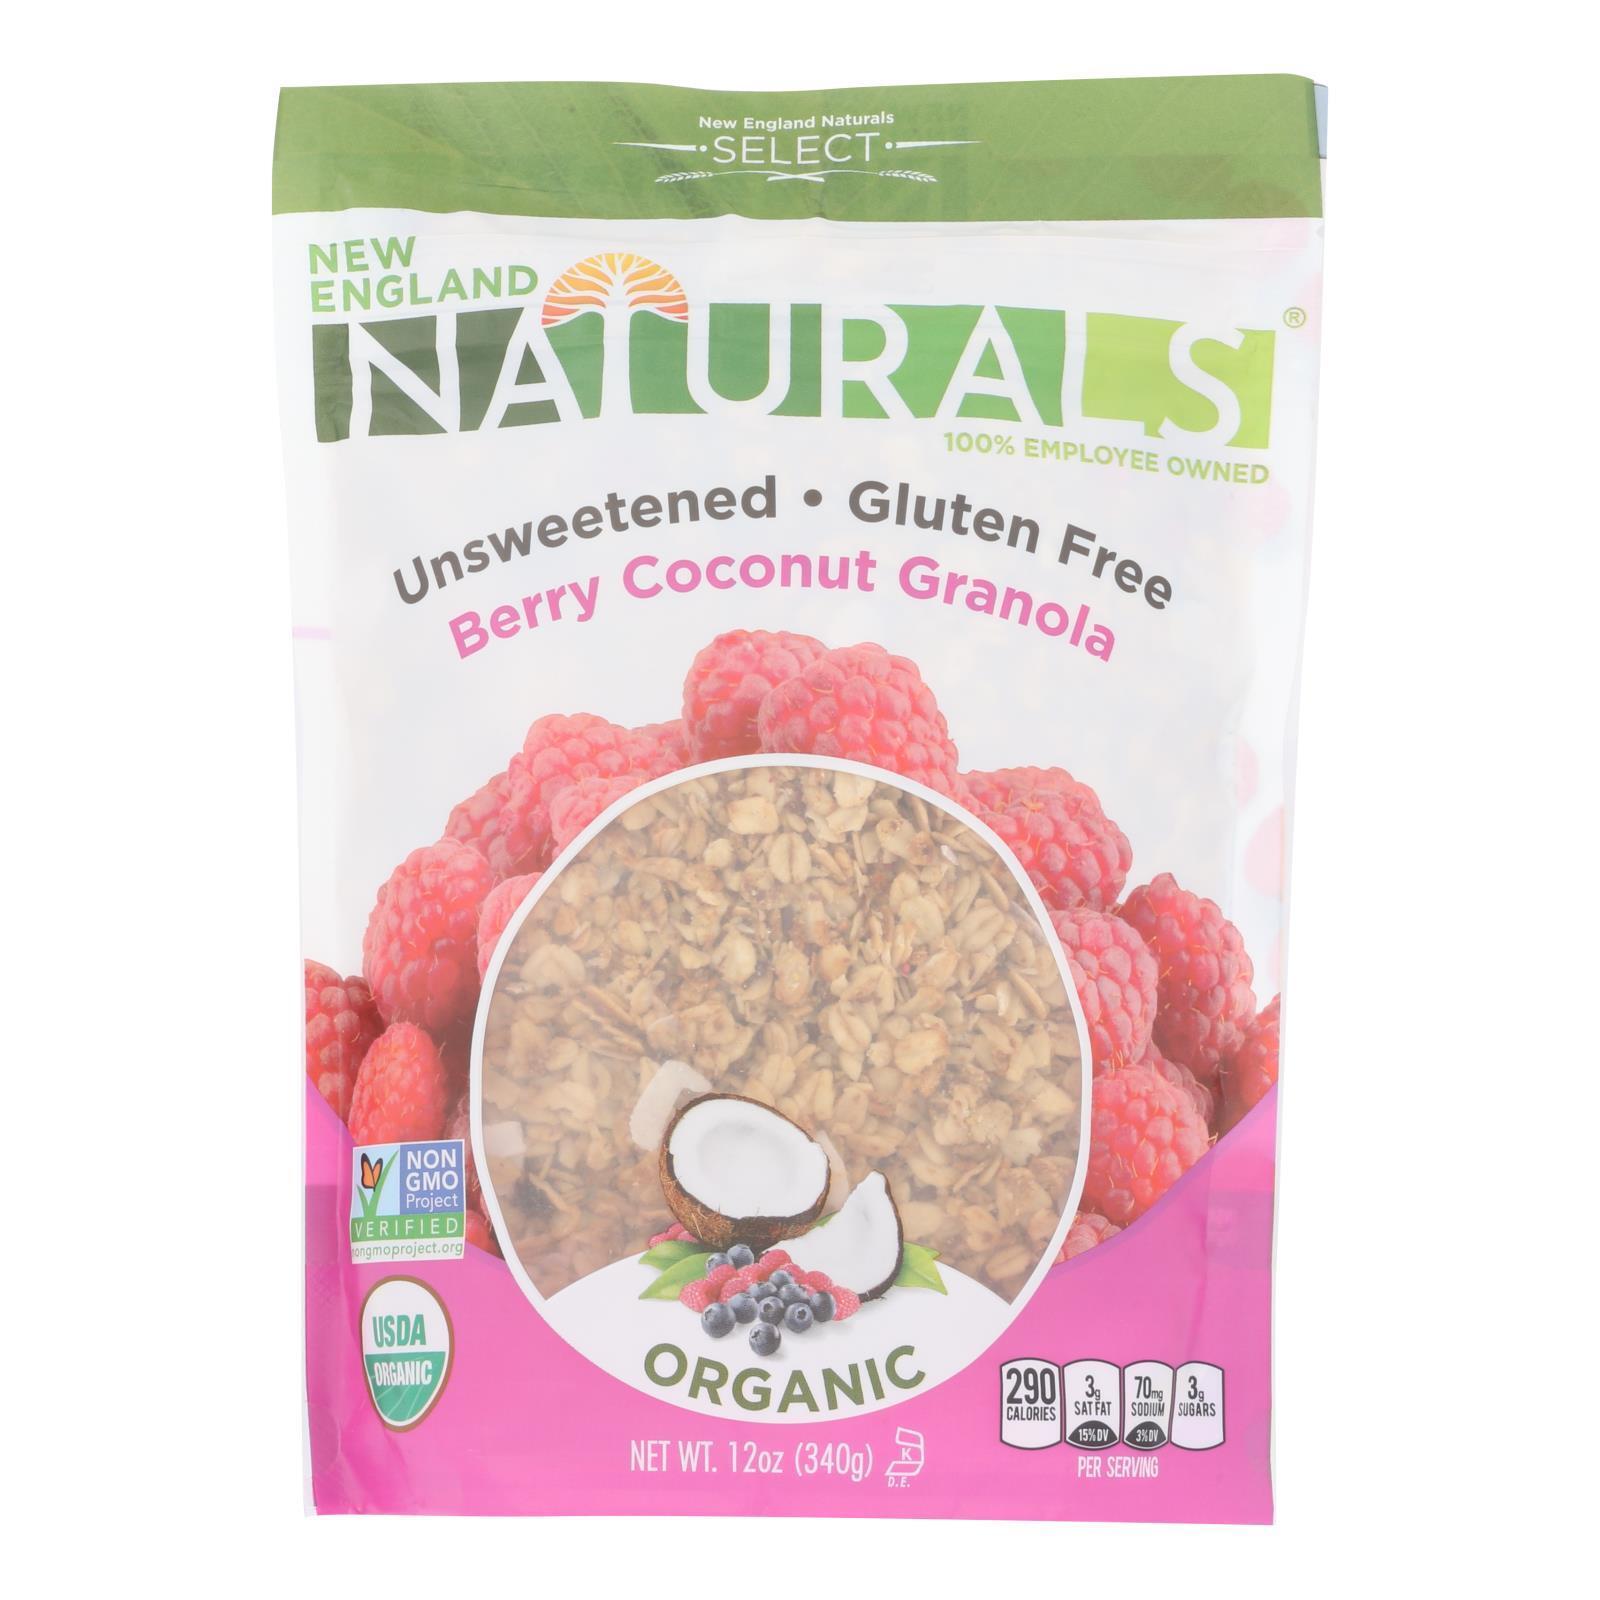 New England Naturals Organic Granola Select Berry - Coconut - Case of 6 - 12 oz.